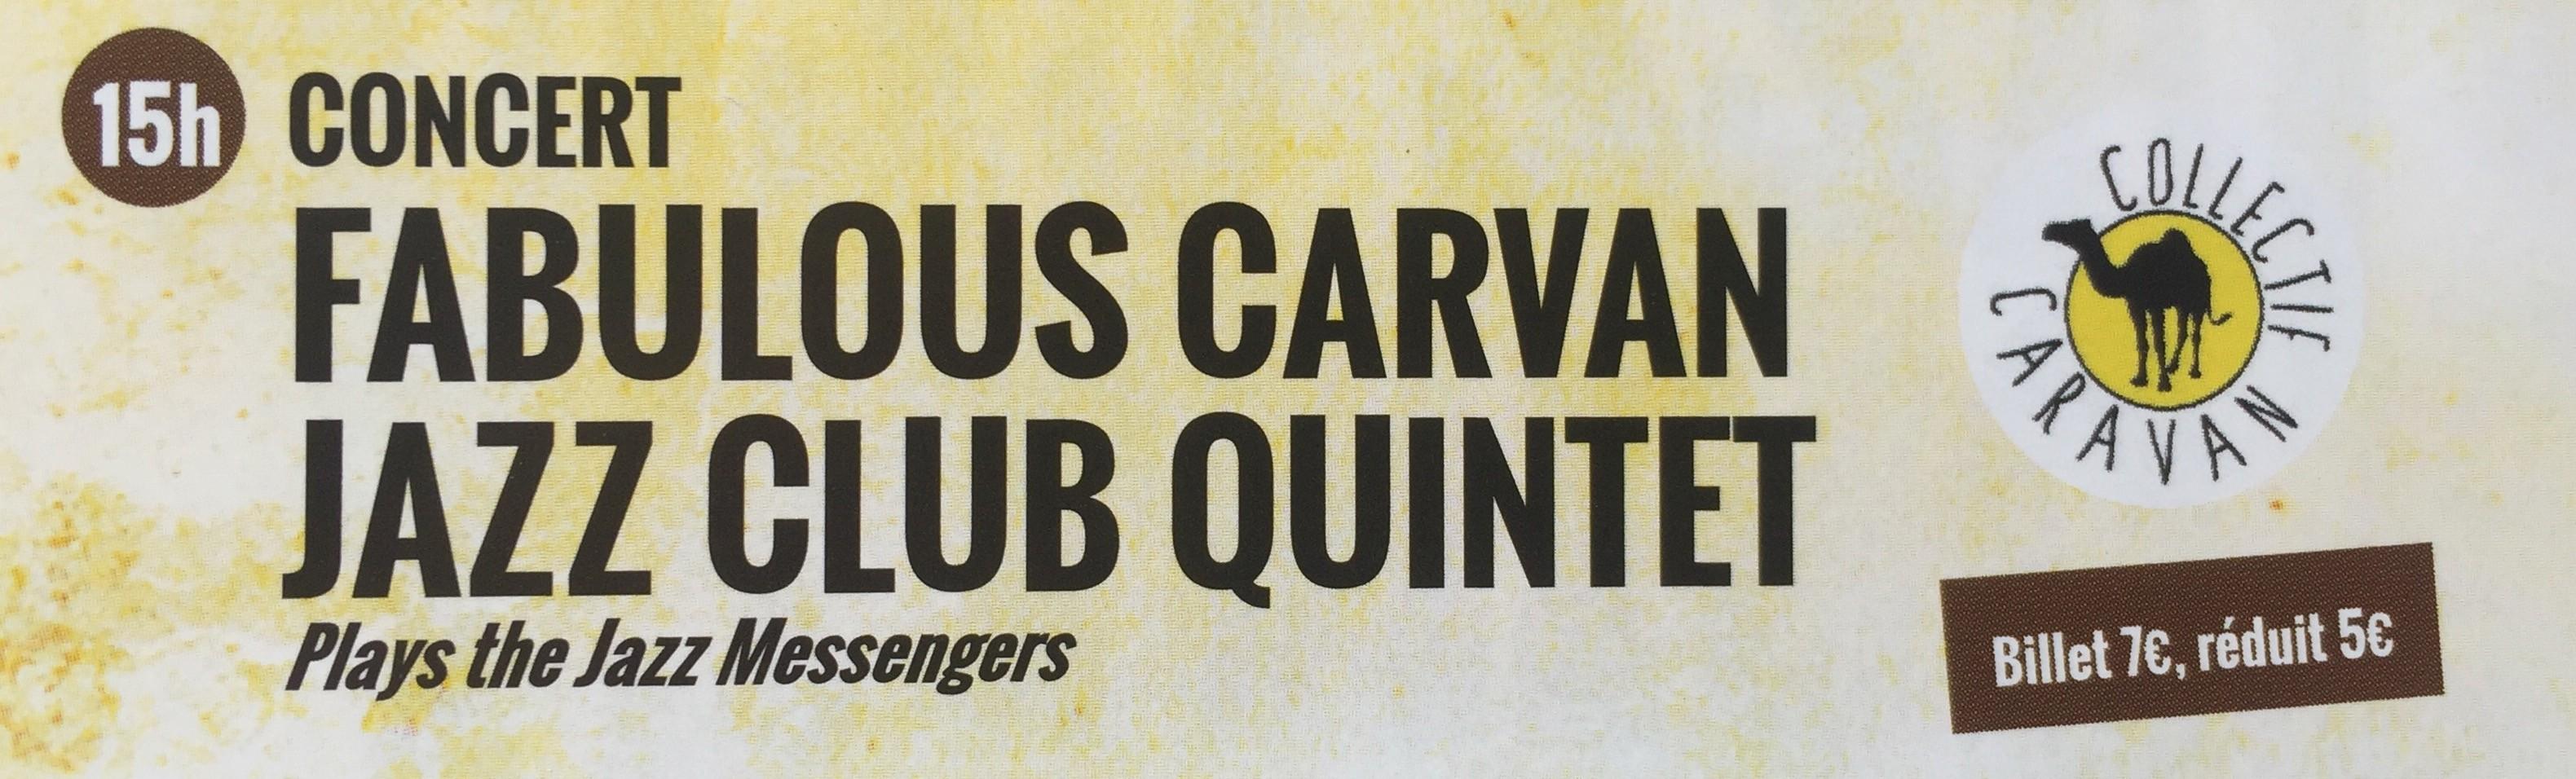 Fabulous Caravan Jazz Club Quintet